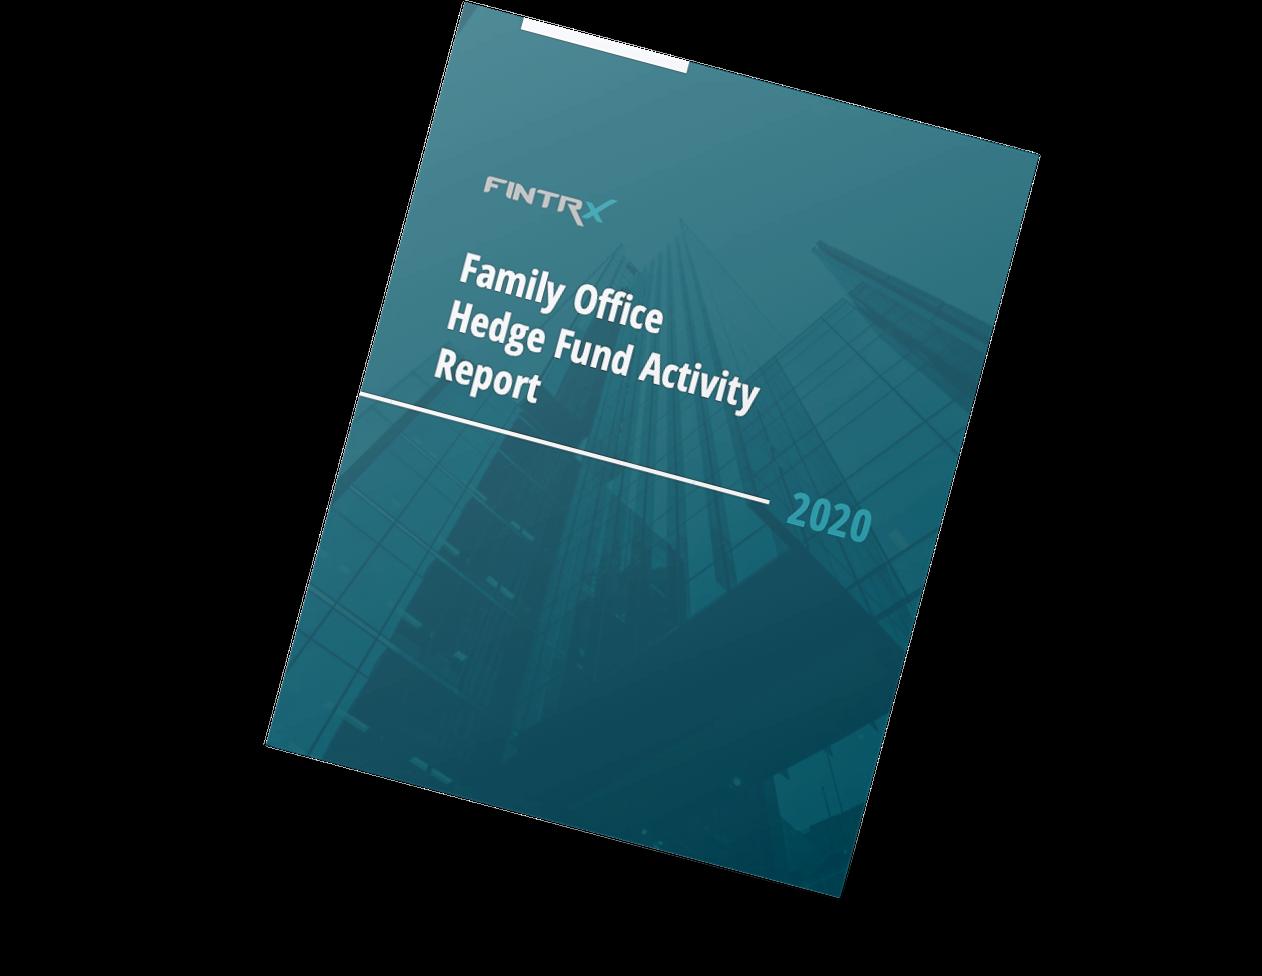 FINTRX 2020 Hedge Fund Activity Report